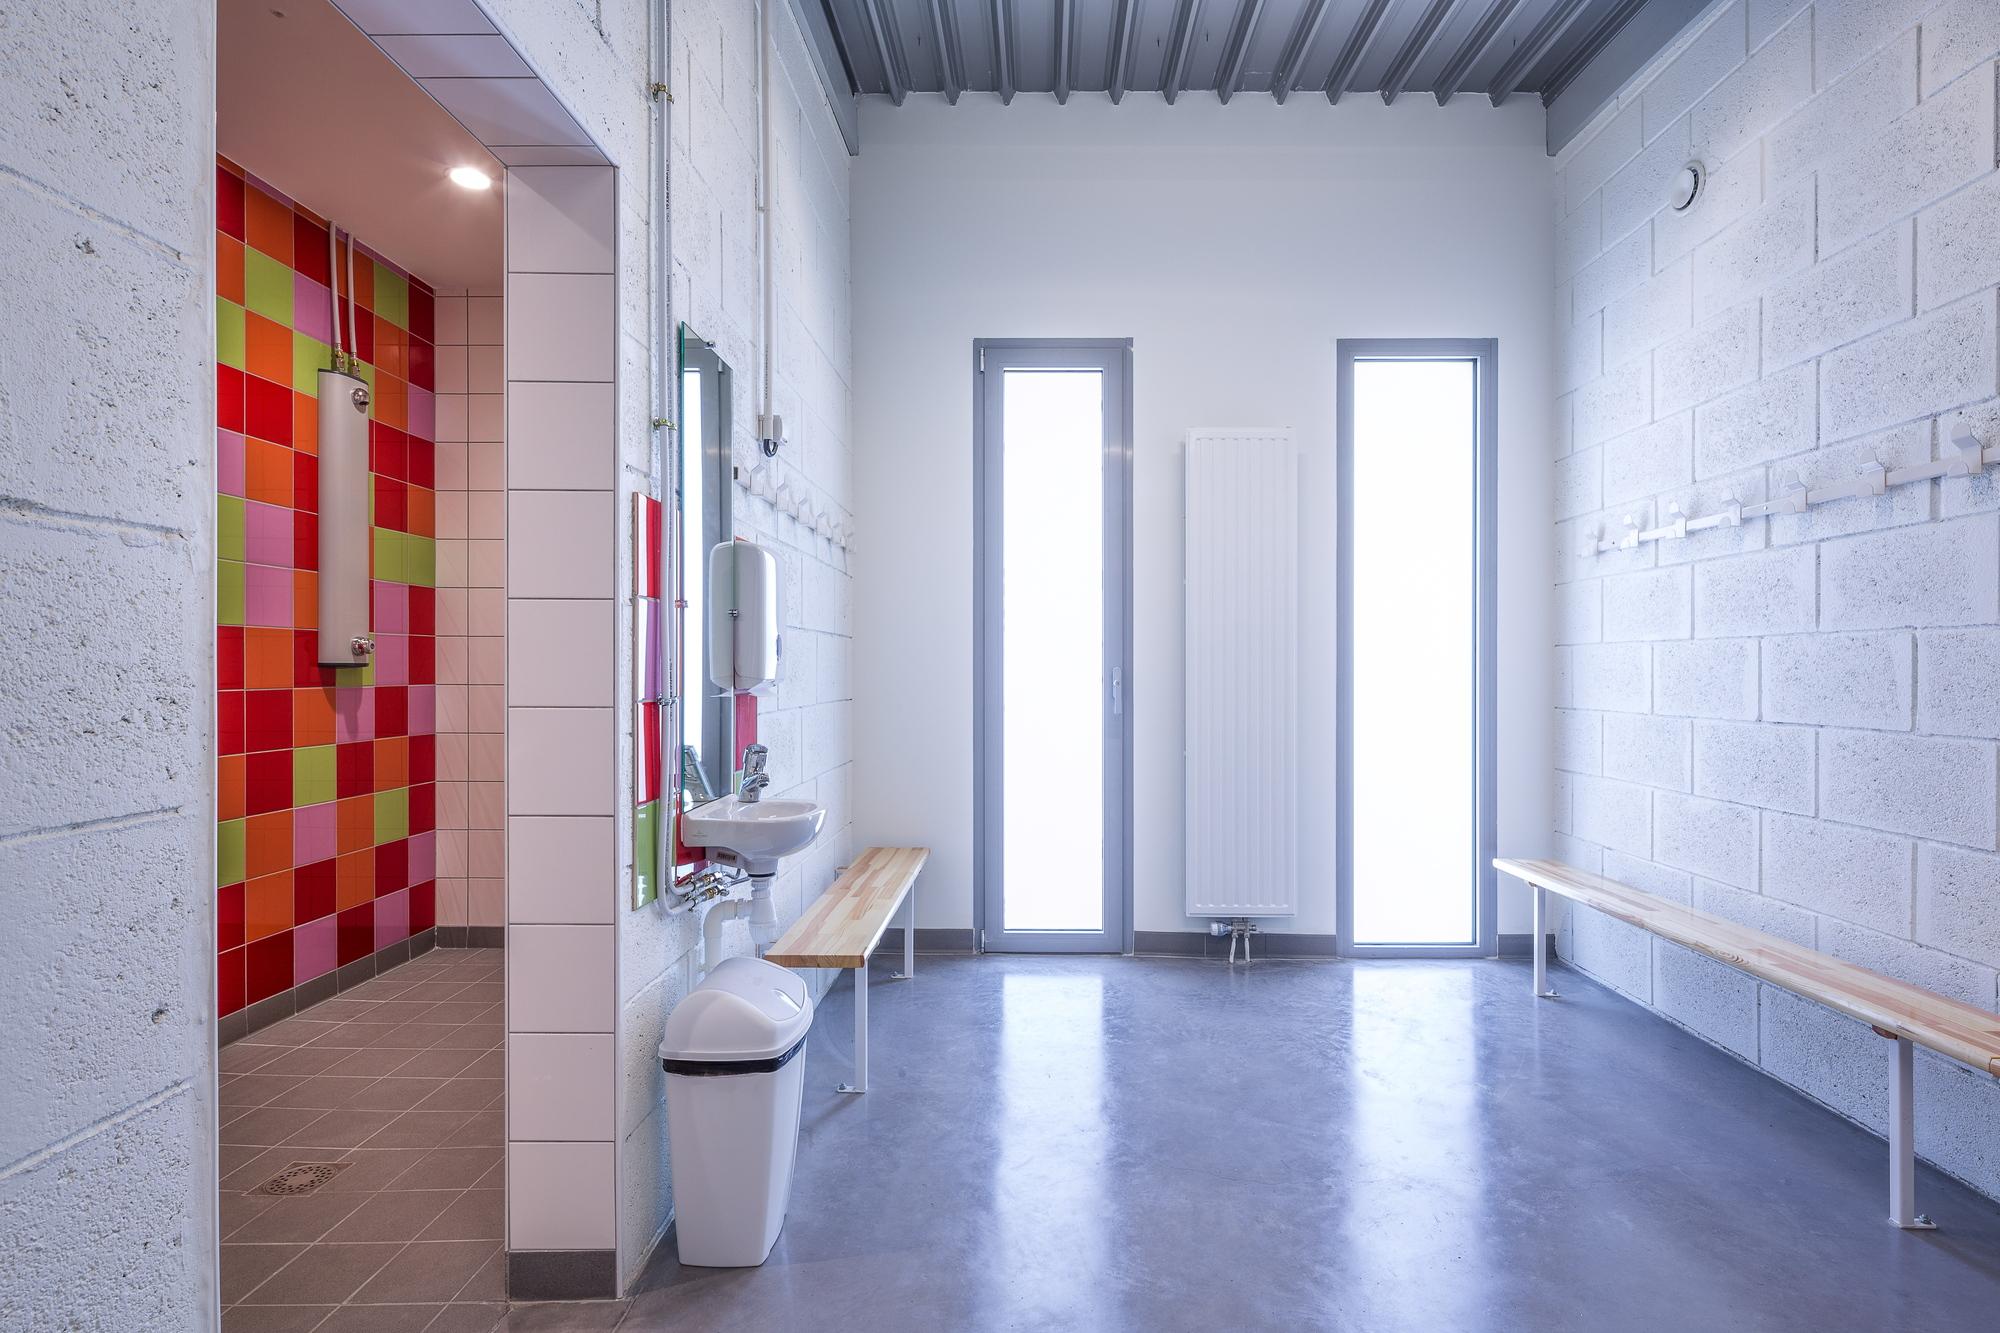 galer a de gym enoseis eno architectes 5. Black Bedroom Furniture Sets. Home Design Ideas